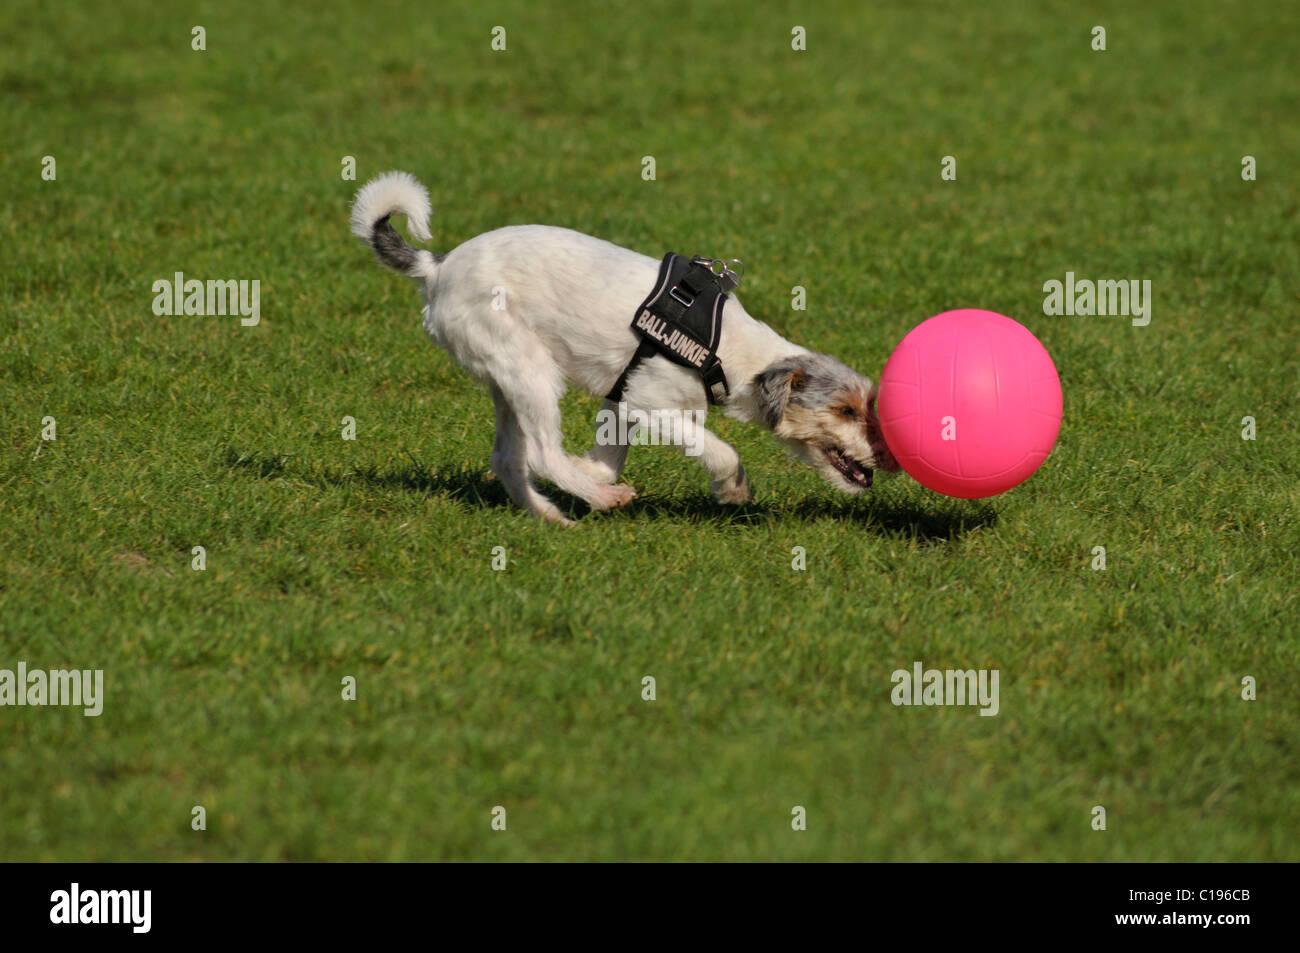 Terrier pushing his pink ball - Stock Image